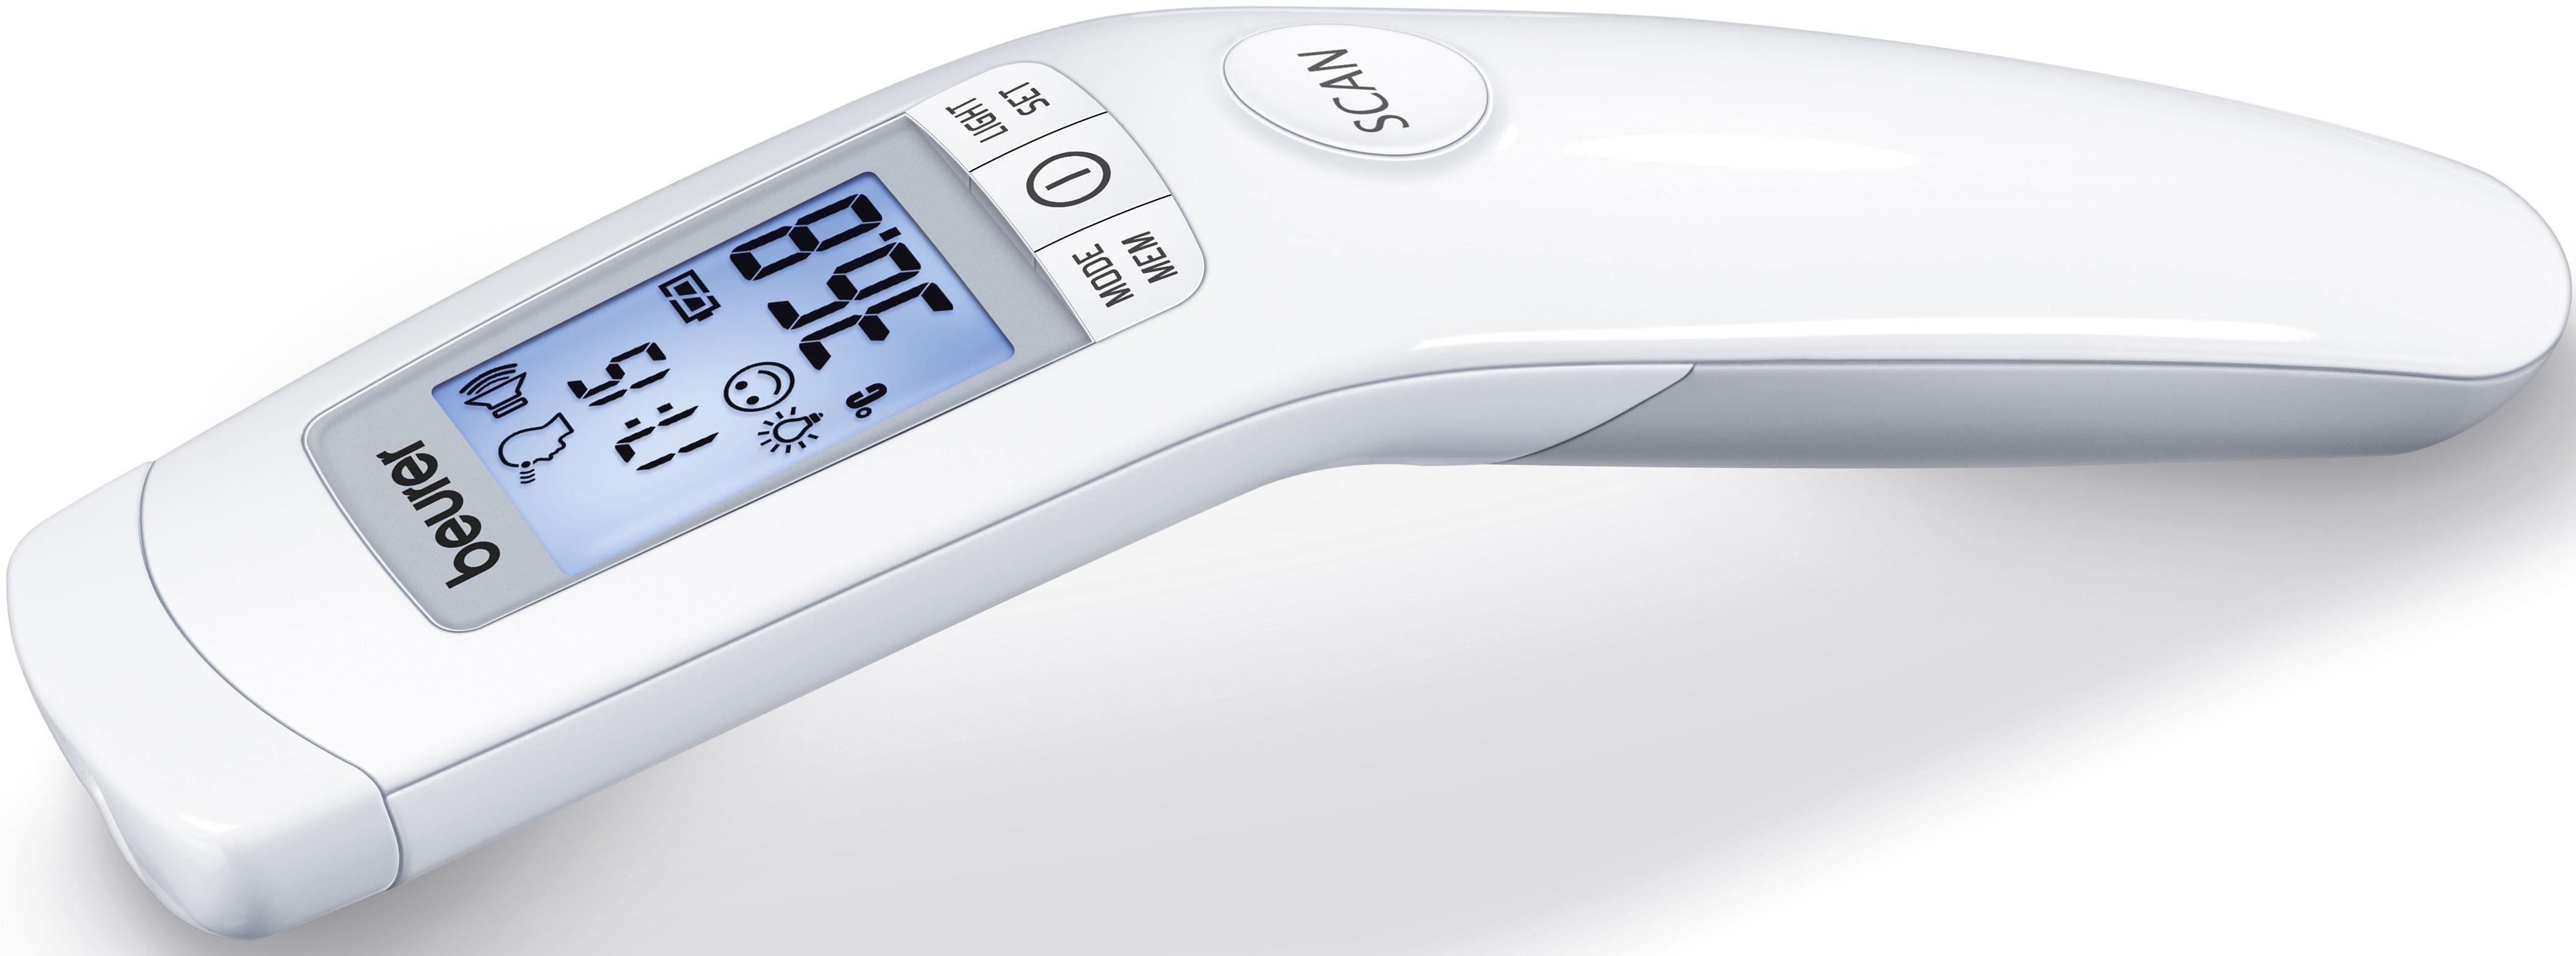 Beurer Kontaktloses Fieberthermometer FT 90